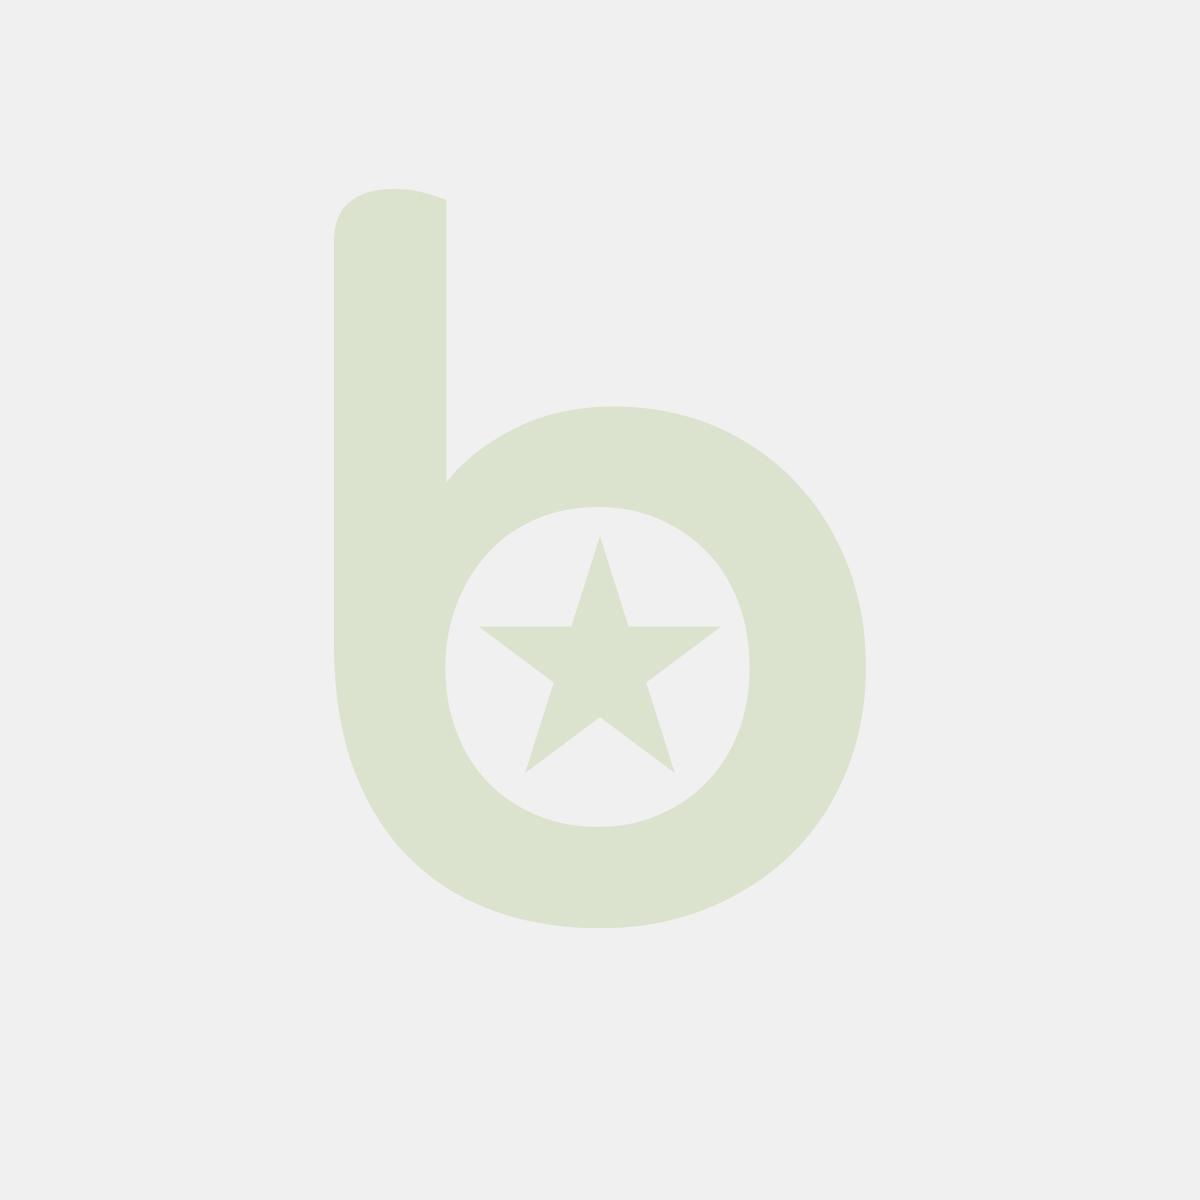 FINGERFOOD - pucharek 95ml PS biały 5,7x5,8x5,7 op. 25 sztuk